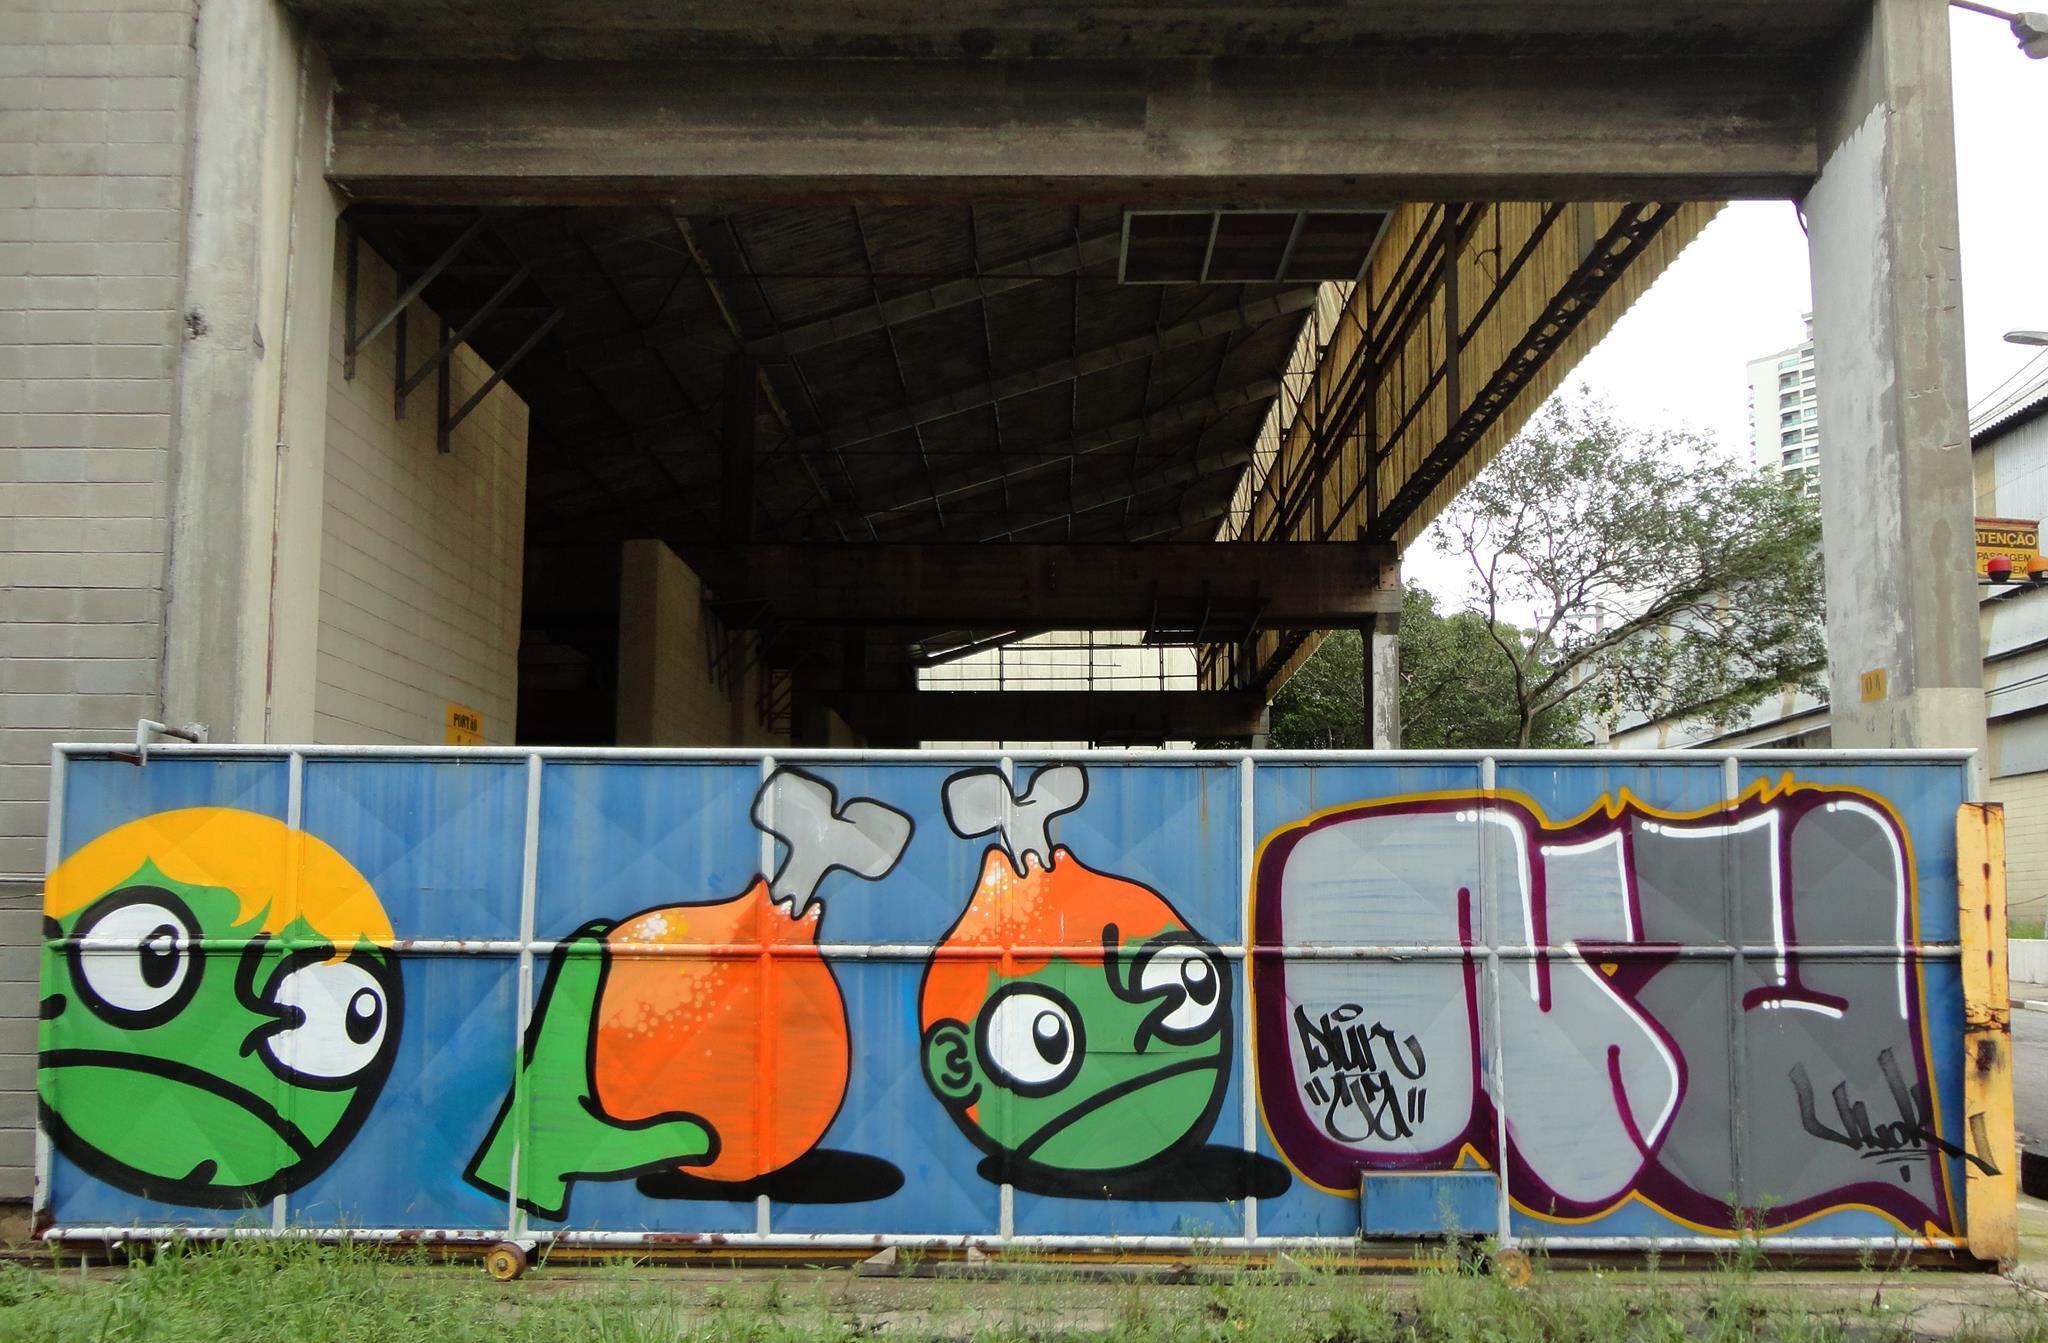 loucos-graffiti-sao-paulo-13